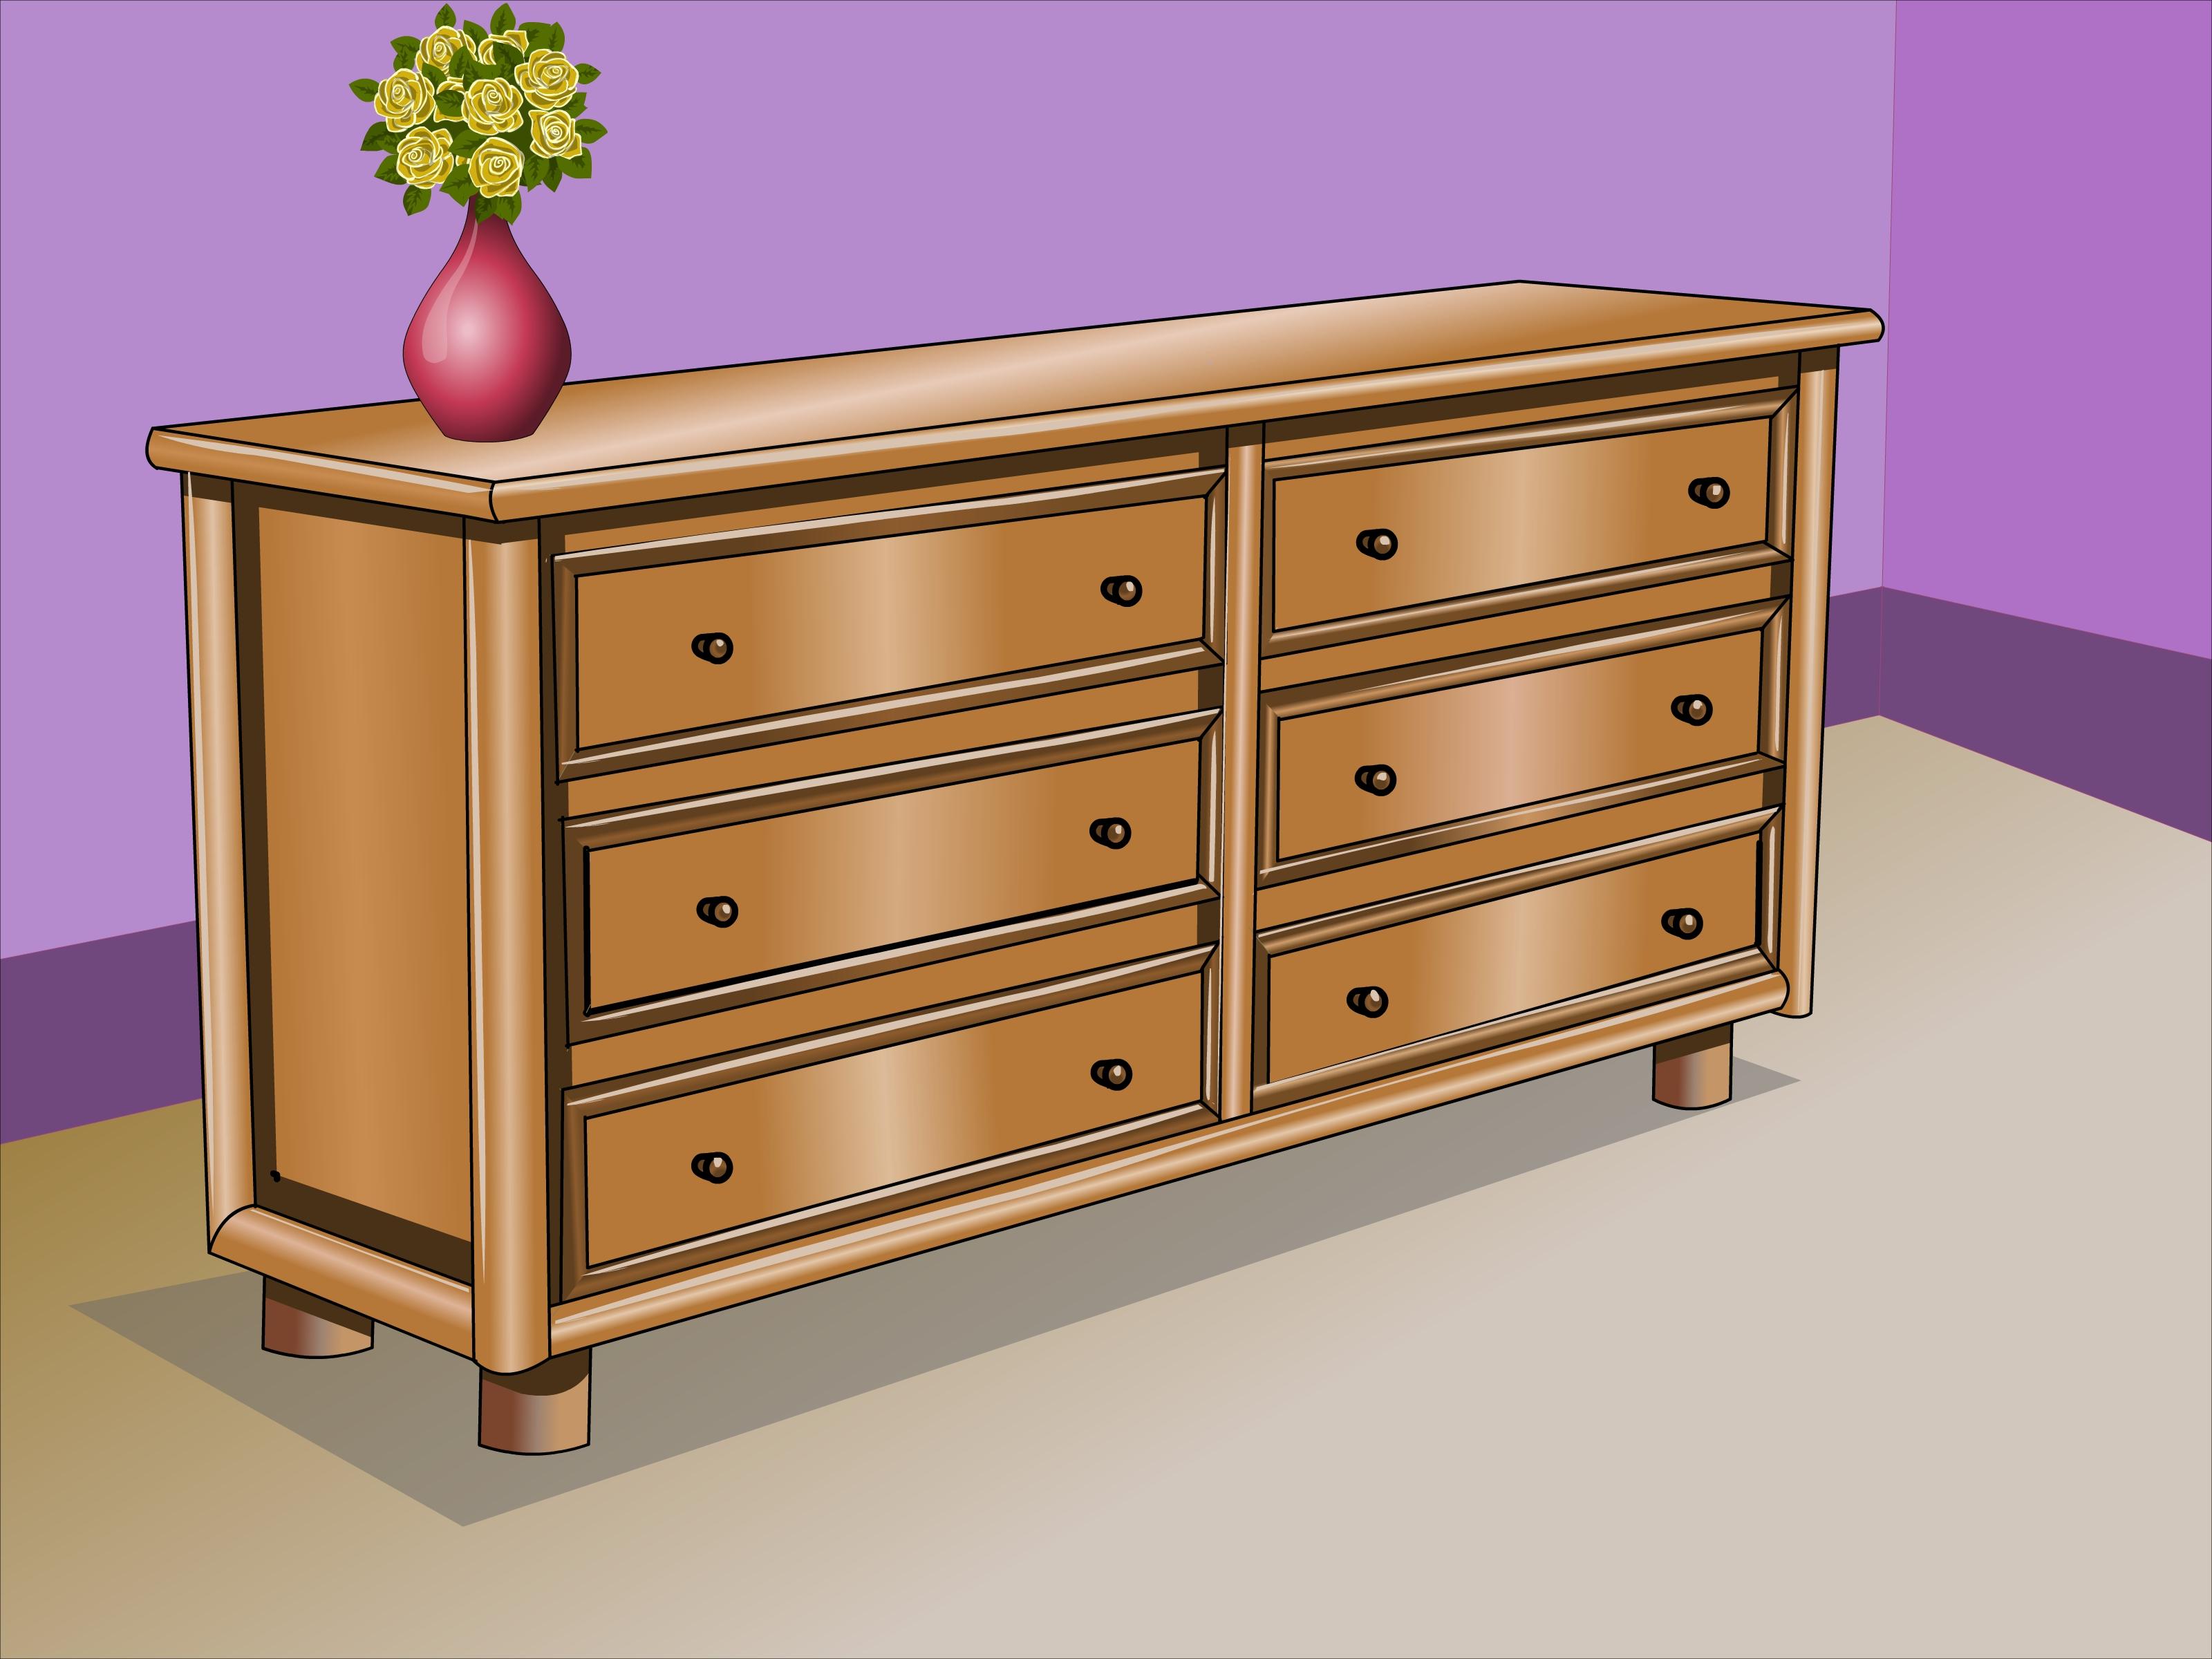 9 Ways to Refinish a Dresser